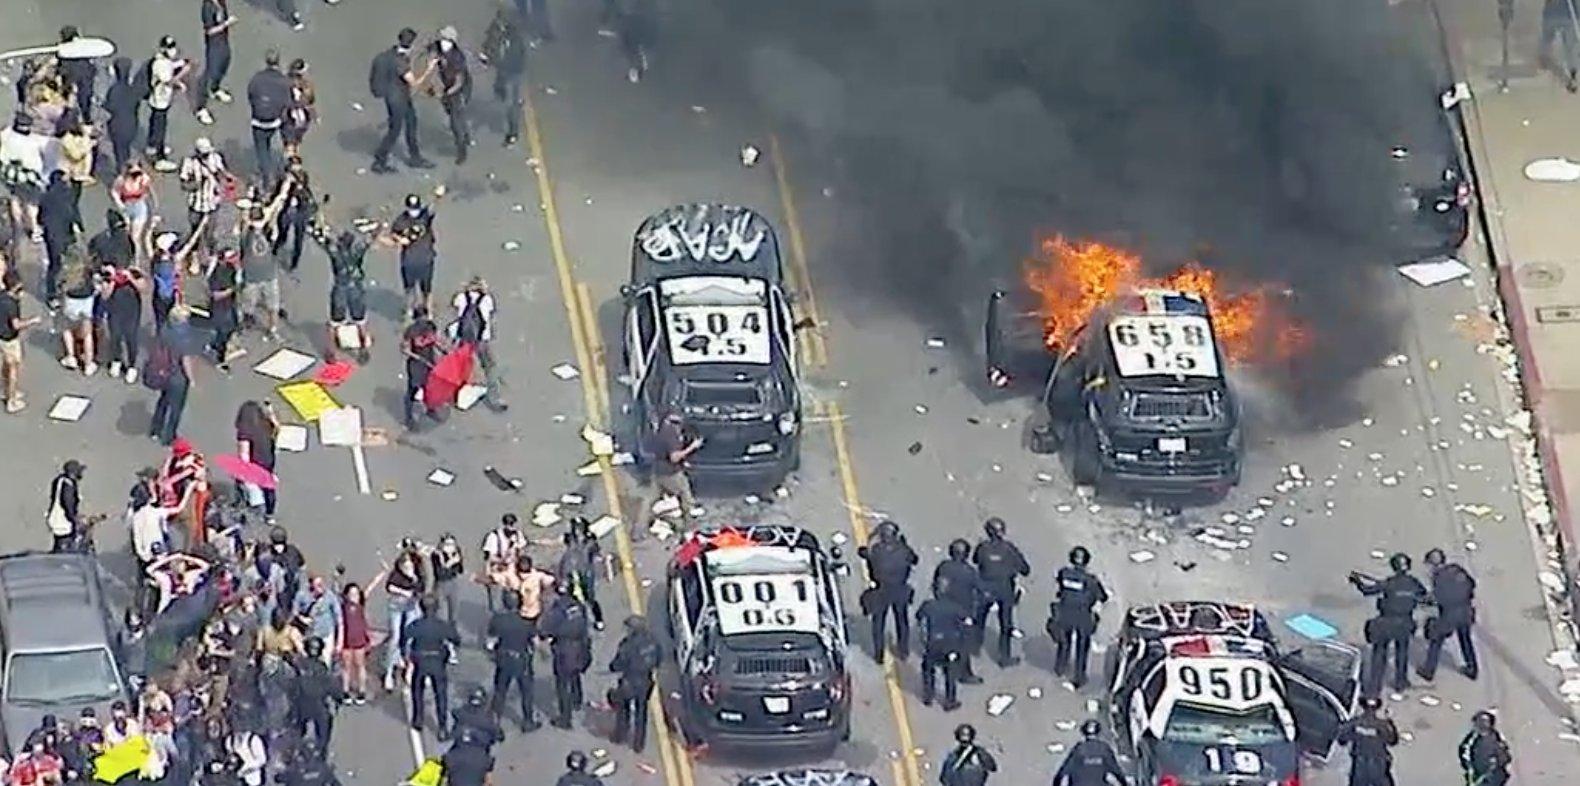 George Floyd Riots in Los Angeles, CA | Entertane News